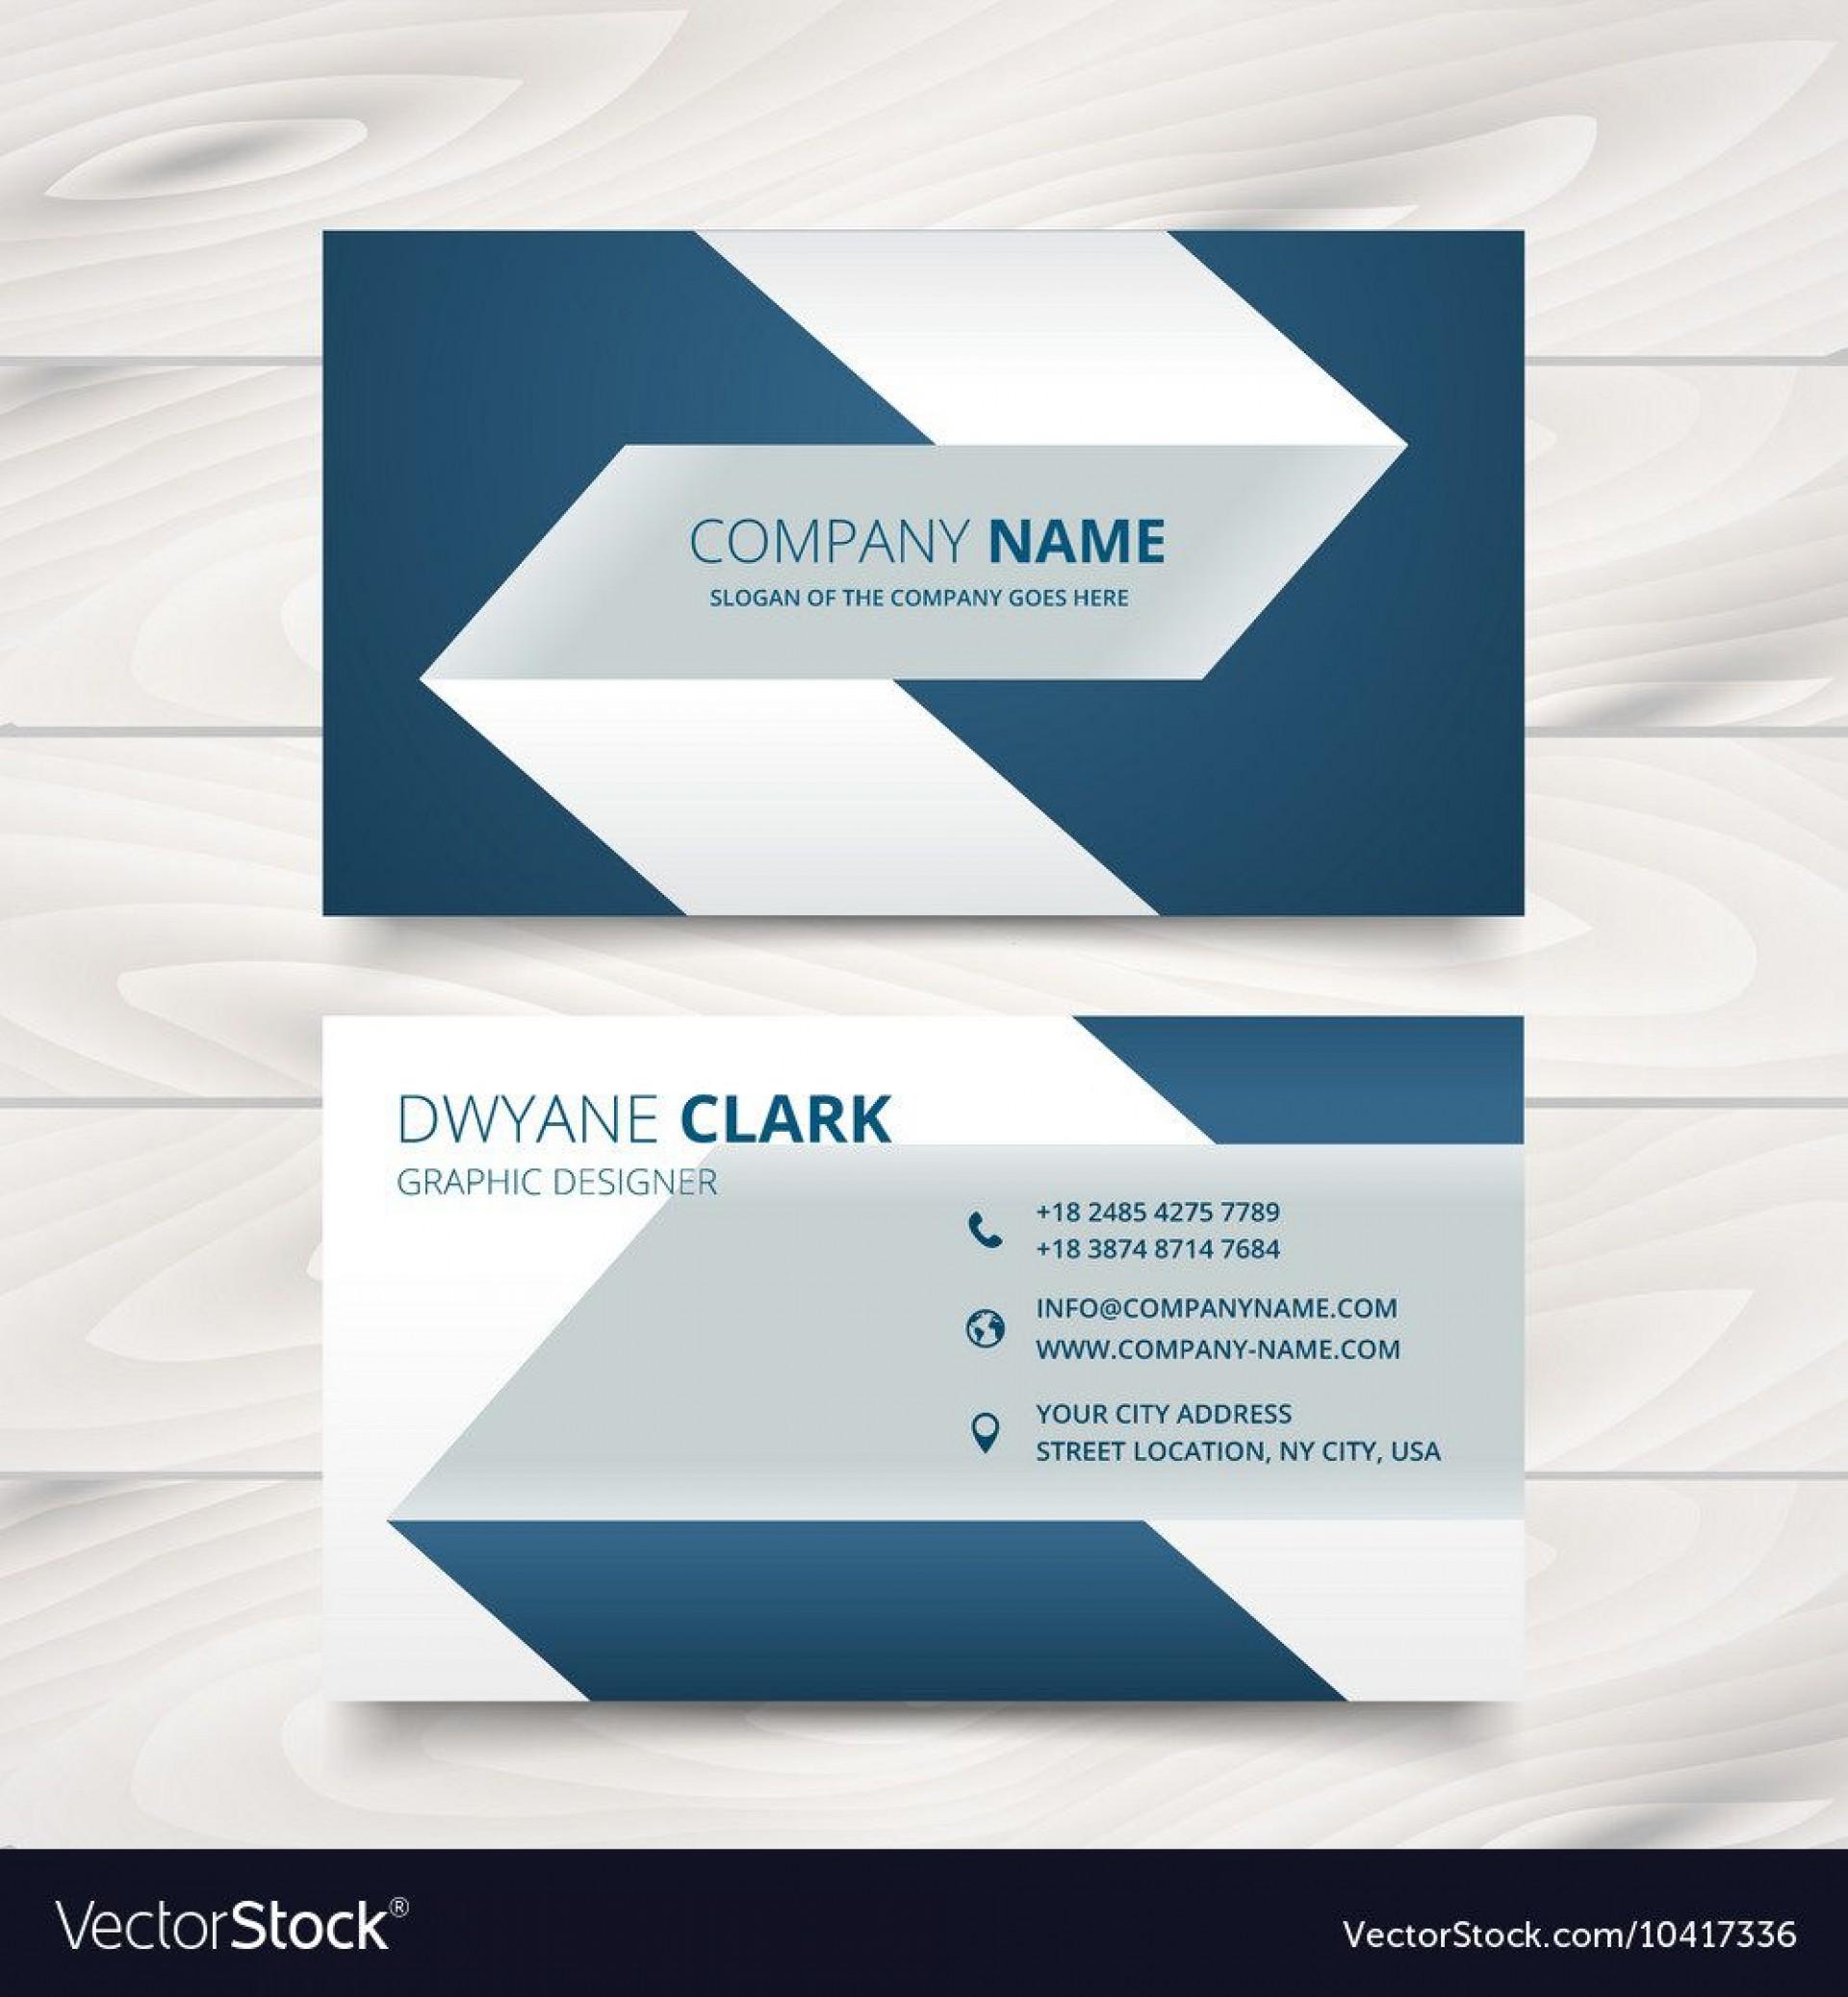 005 Fascinating Simple Visiting Card Design Inspiration  Busines Idea Psd File Free Download1920